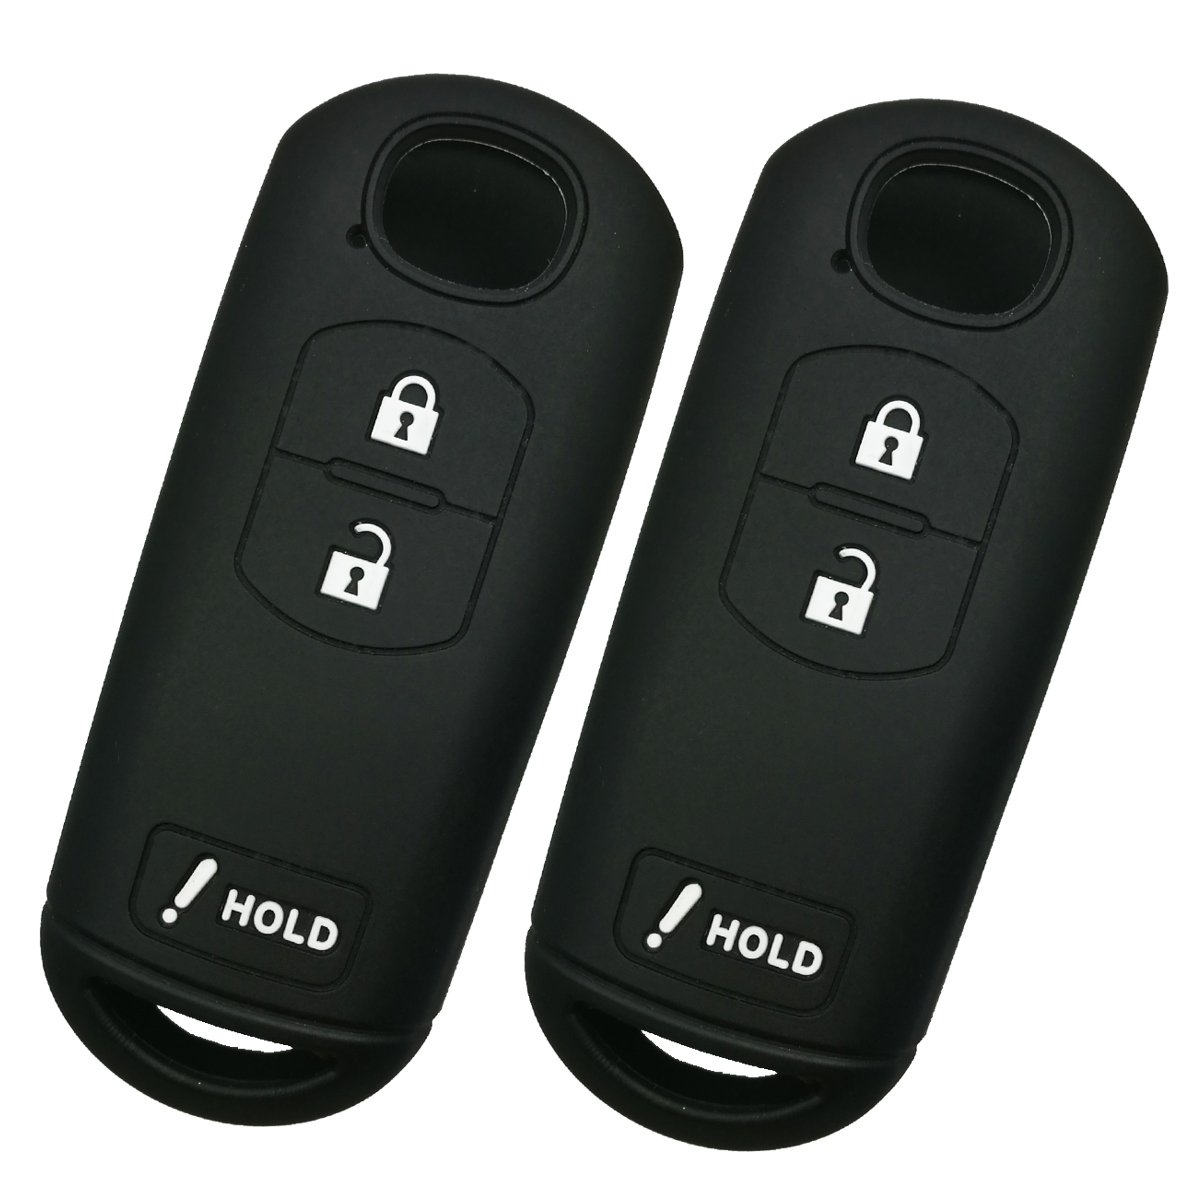 Alegender ゴム 車のキー フォブカバー ケース リモコンホルダー 3ボタン スマート キーレス エントリー リモート Mazda 3 CX3 CX5 CX7 CX9 SPEED3 WAZSKE13D01 B071HVYV55 2点ブラック 2点ブラック